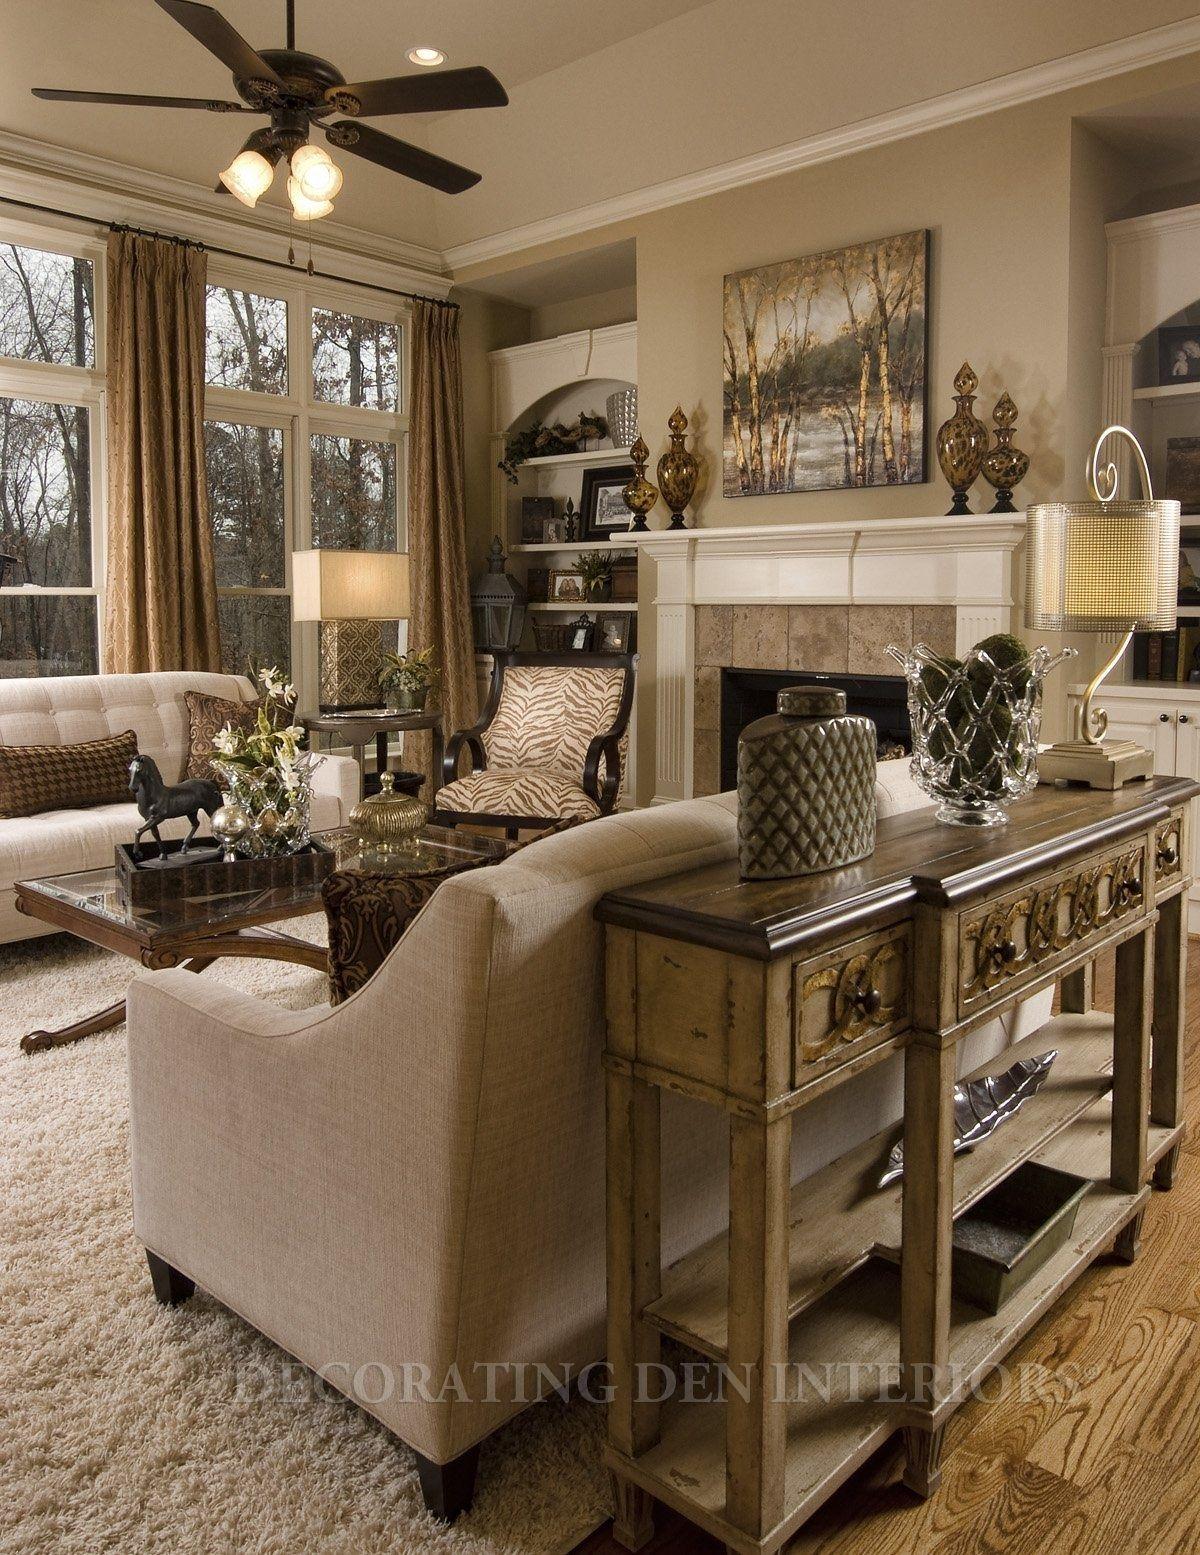 Aqua and brown living room home inspiration home decor - Brown and aqua living room pictures ...